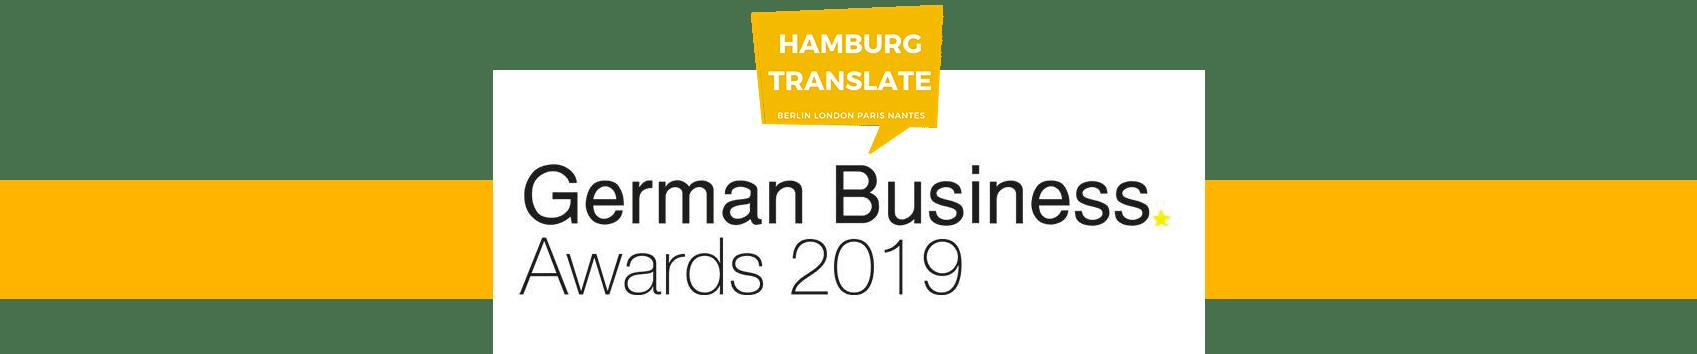 Hamburg Translate